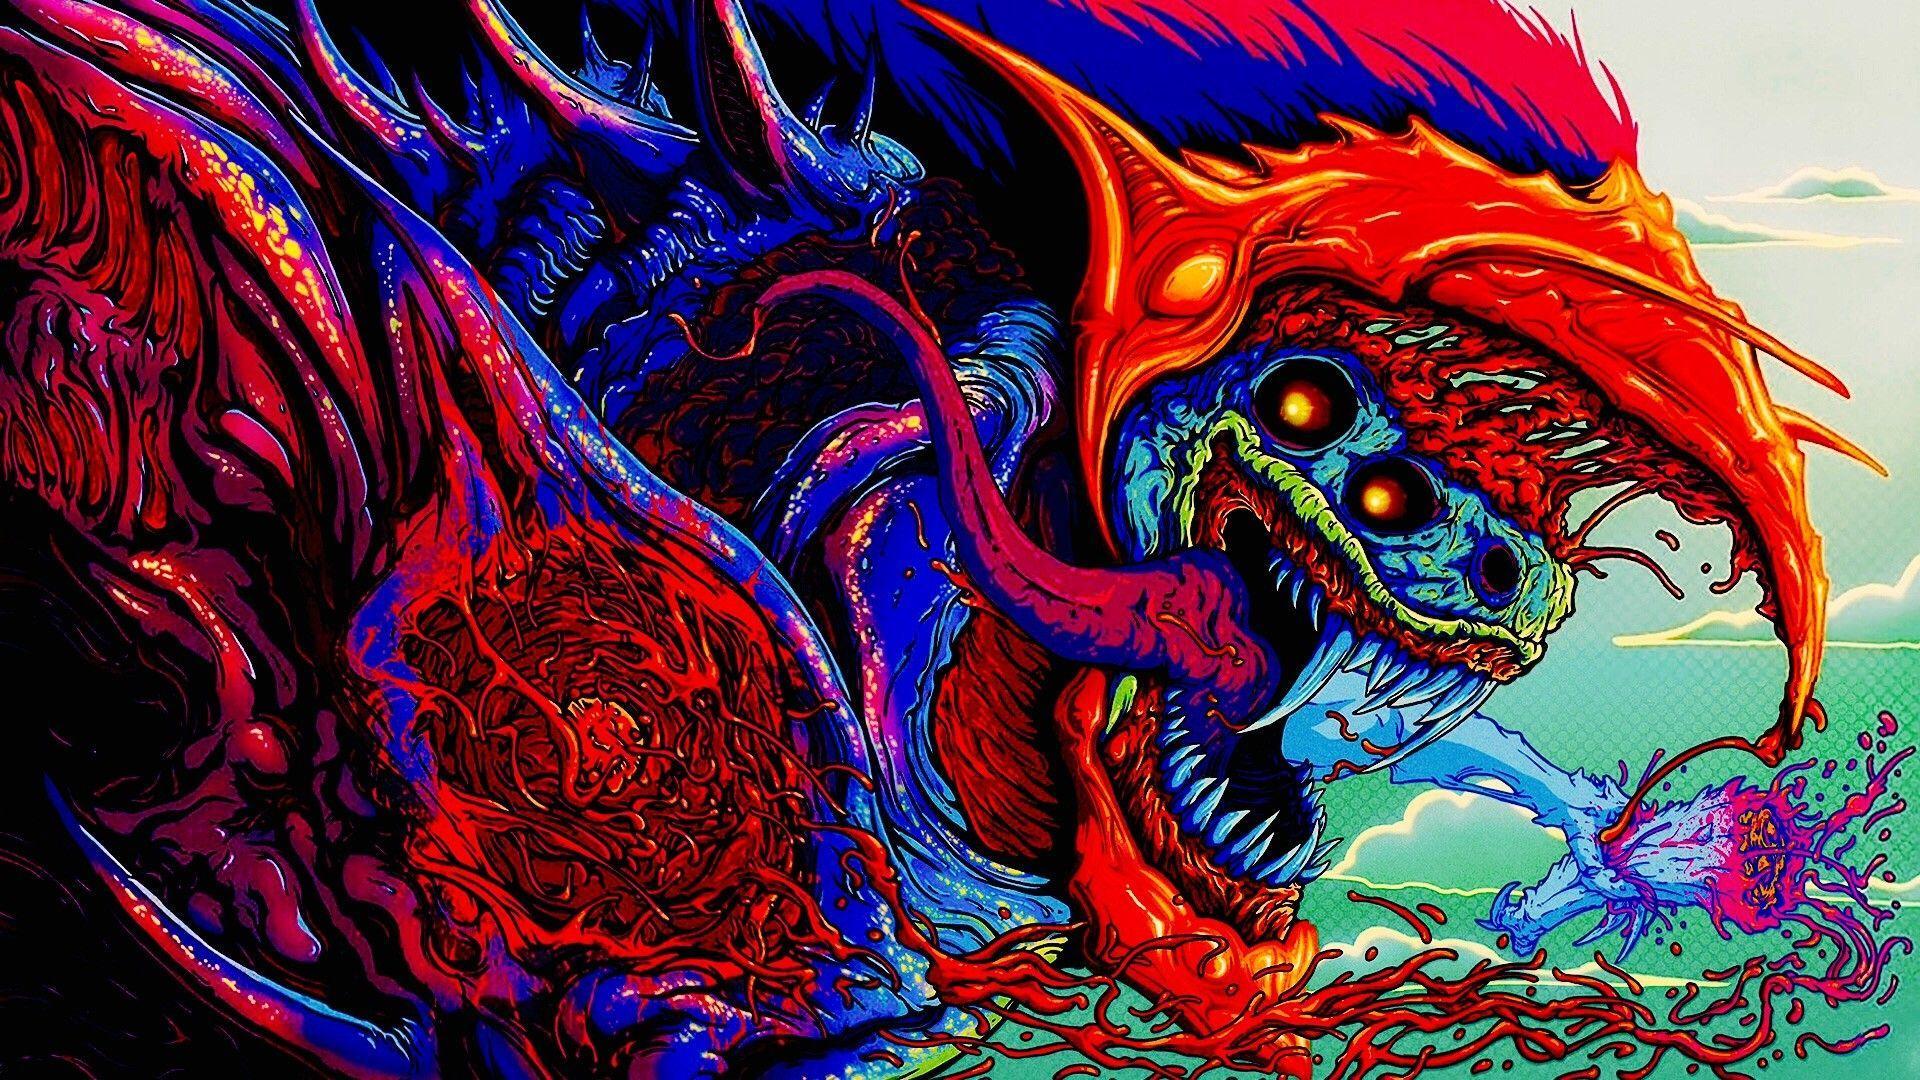 Vaporwave Computer Wallpapers - Top Free Vaporwave ...